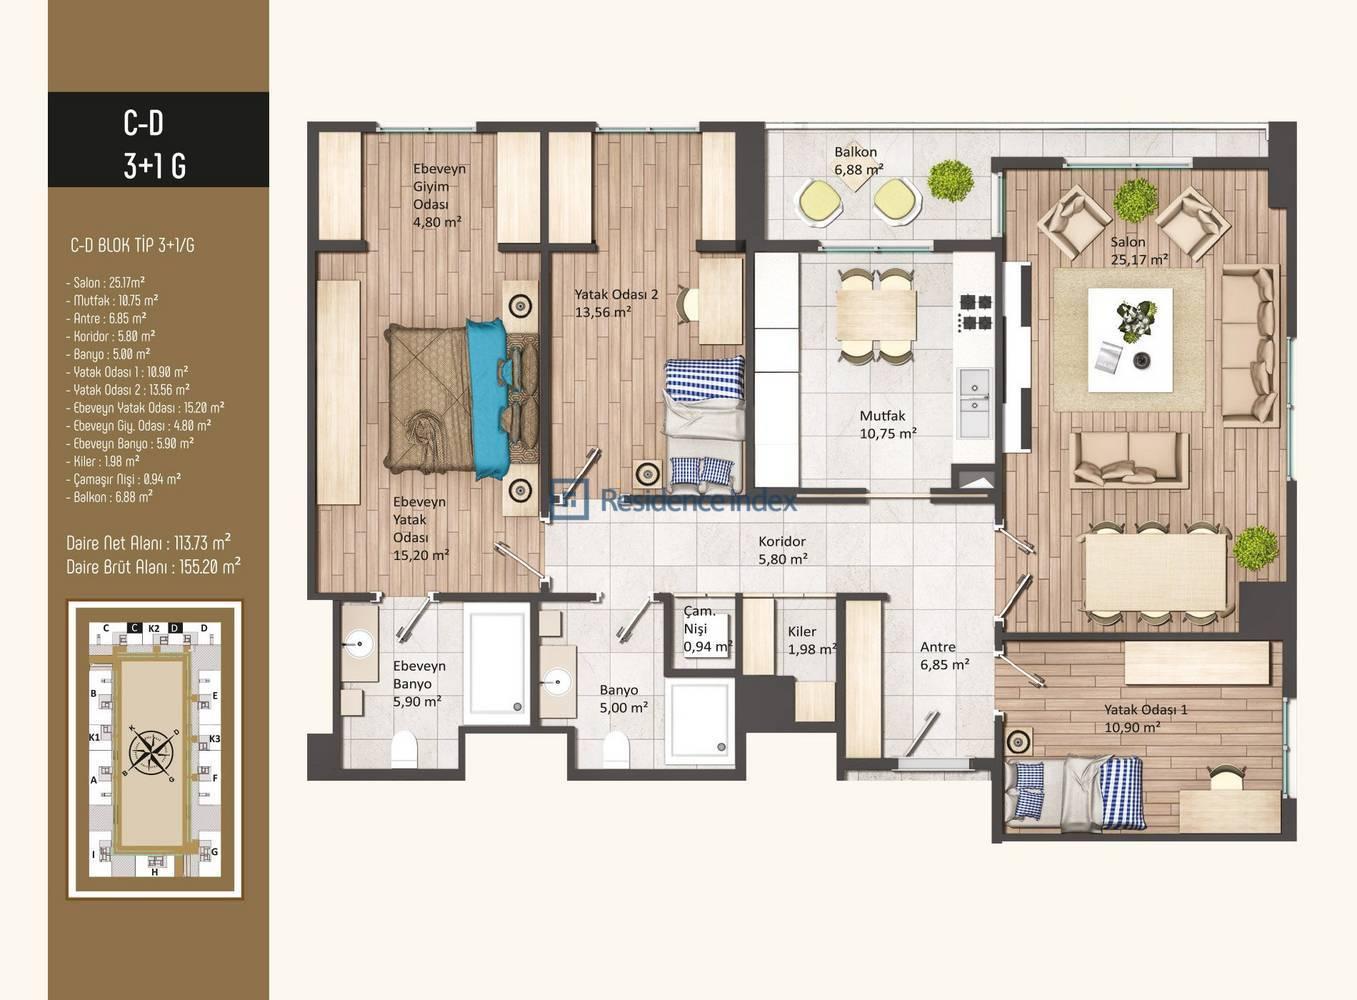 Kameroğlu Metrohome Residence 3+1 G